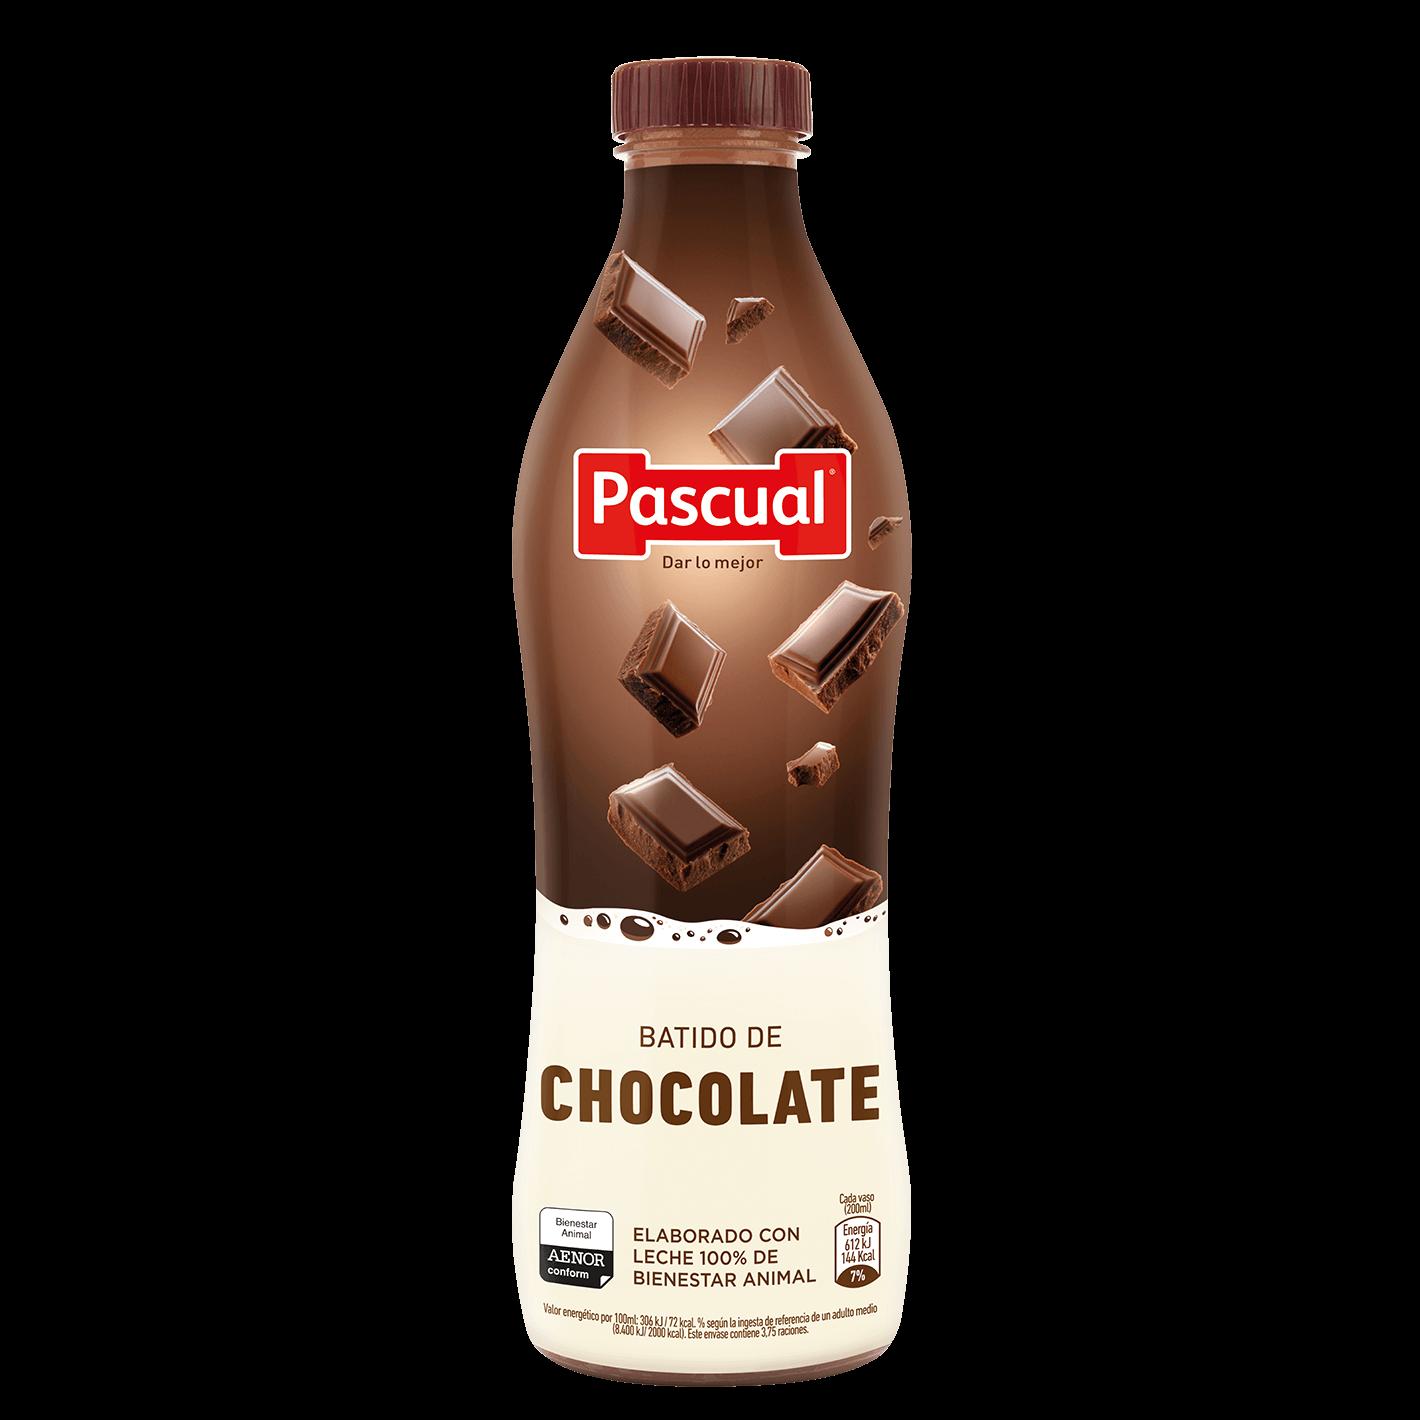 batido chocolate Pascual